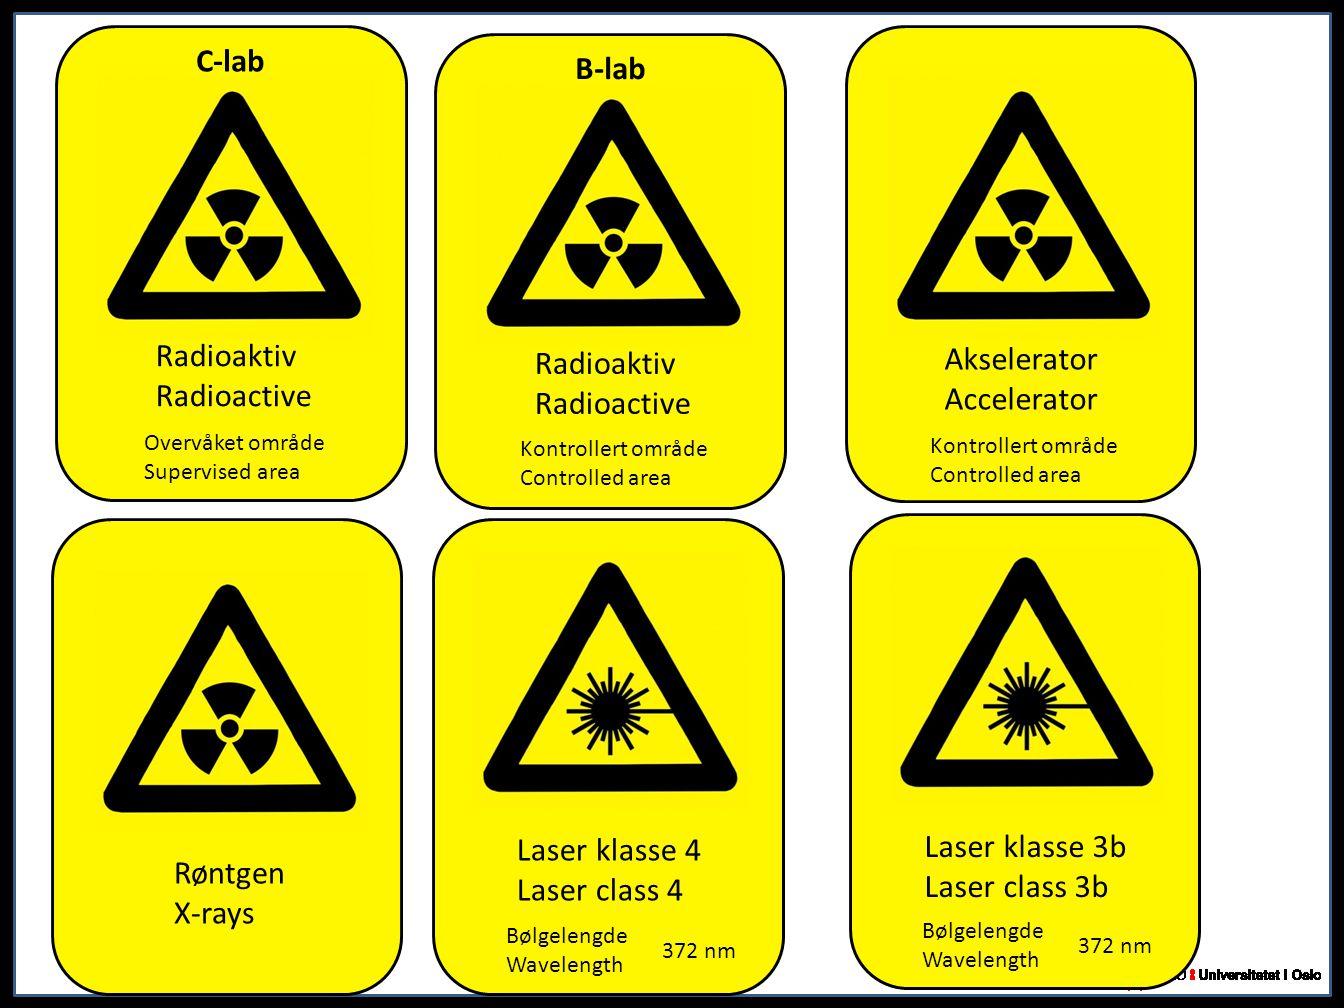 Røntgen X-rays Radioaktiv Radioactive C-lab Overvåket område Supervised area Laser klasse 4 Laser class 4 Bølgelengde Wavelength 372 nm Radioaktiv Rad